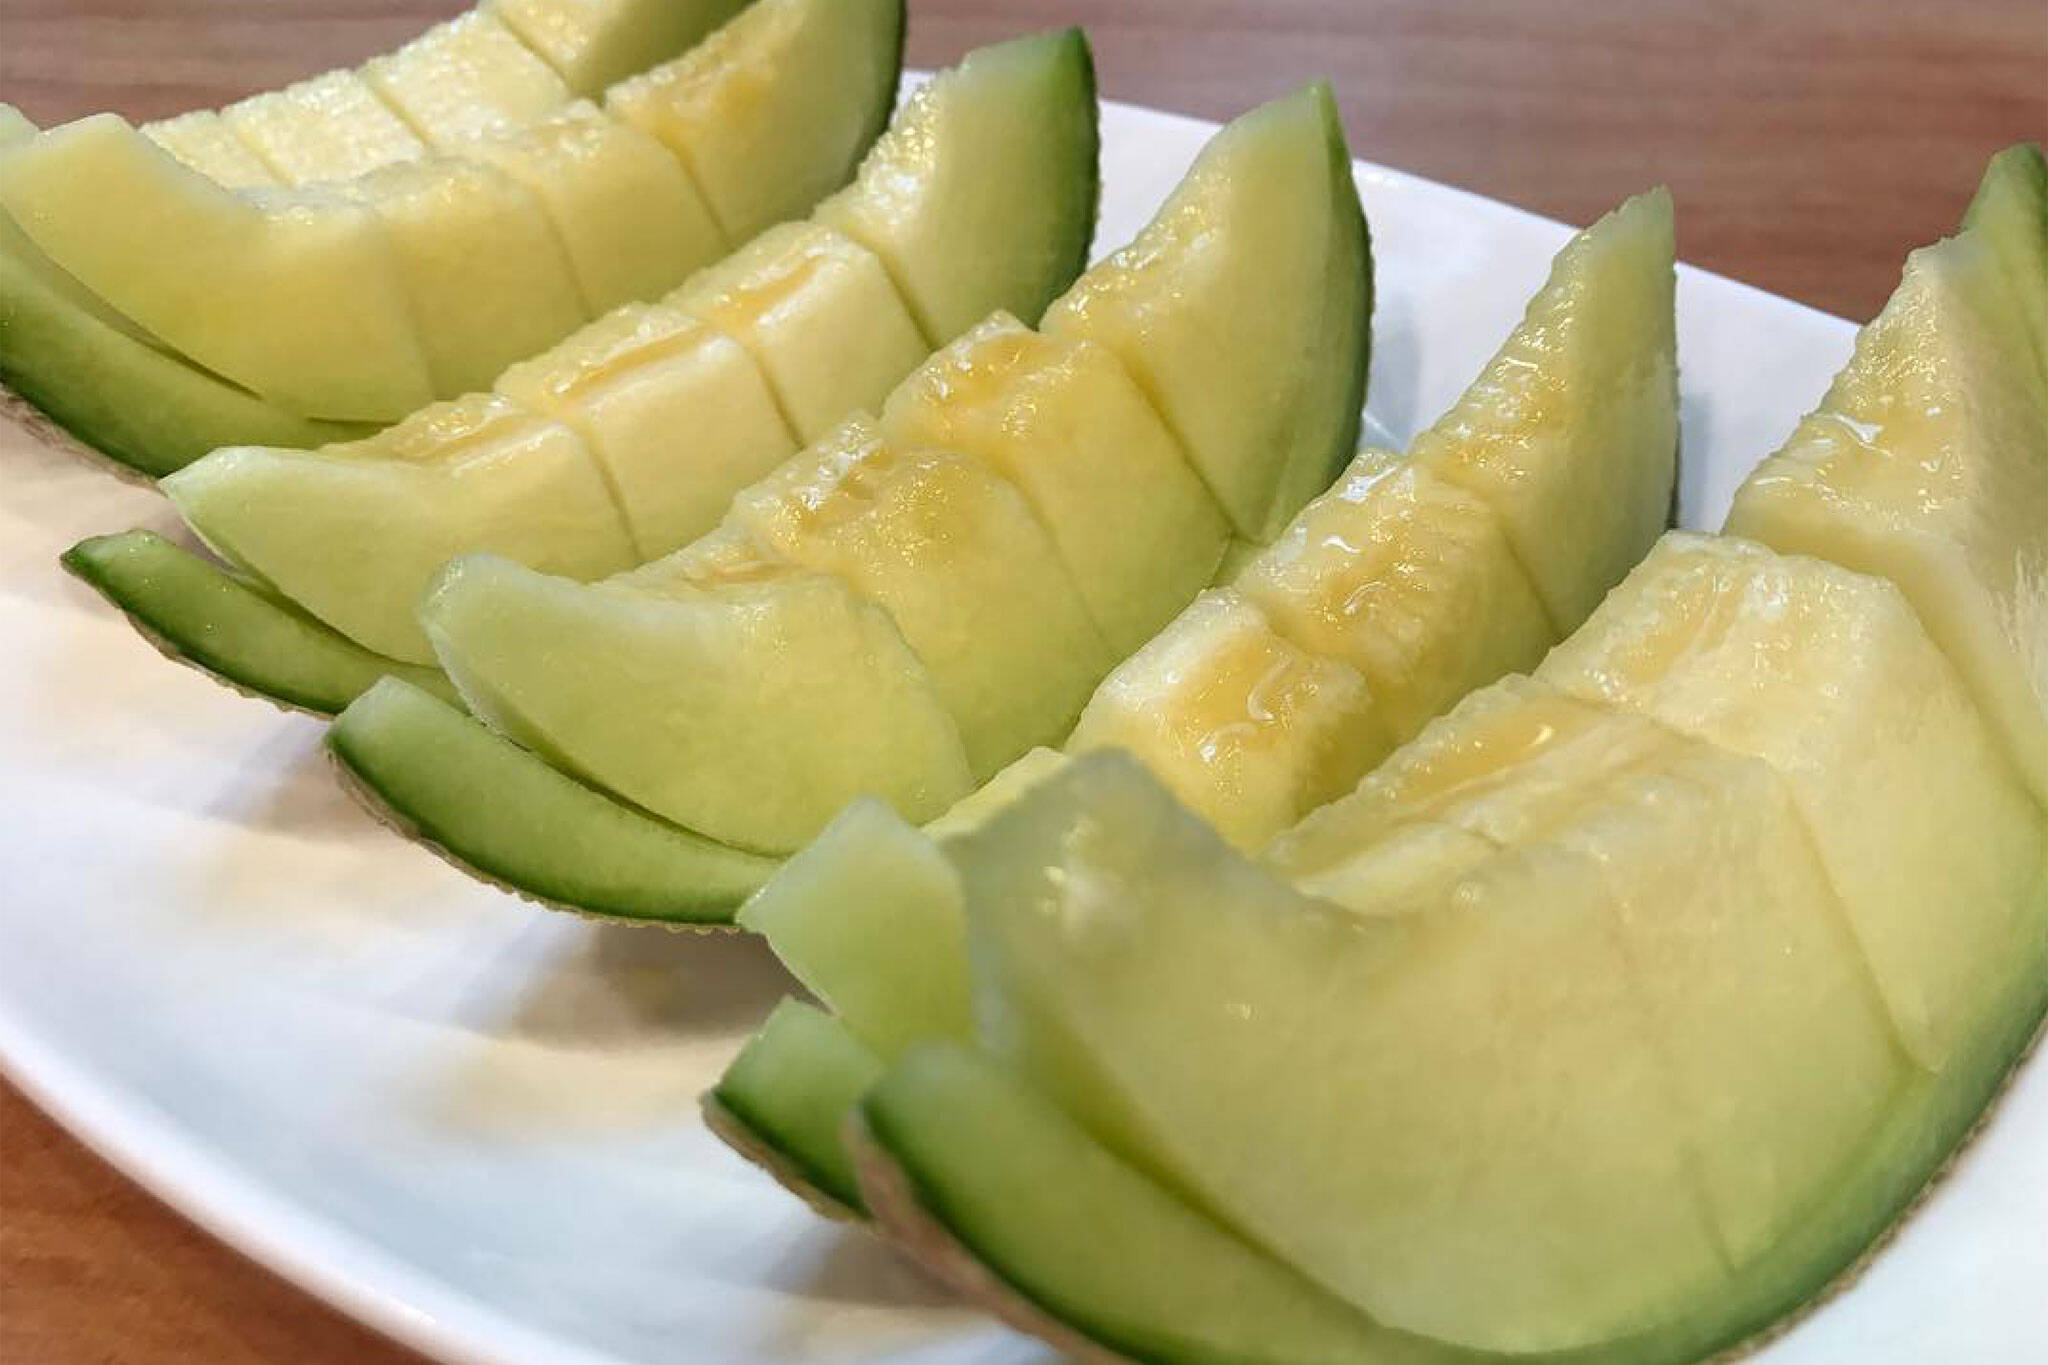 japanese melon toronto